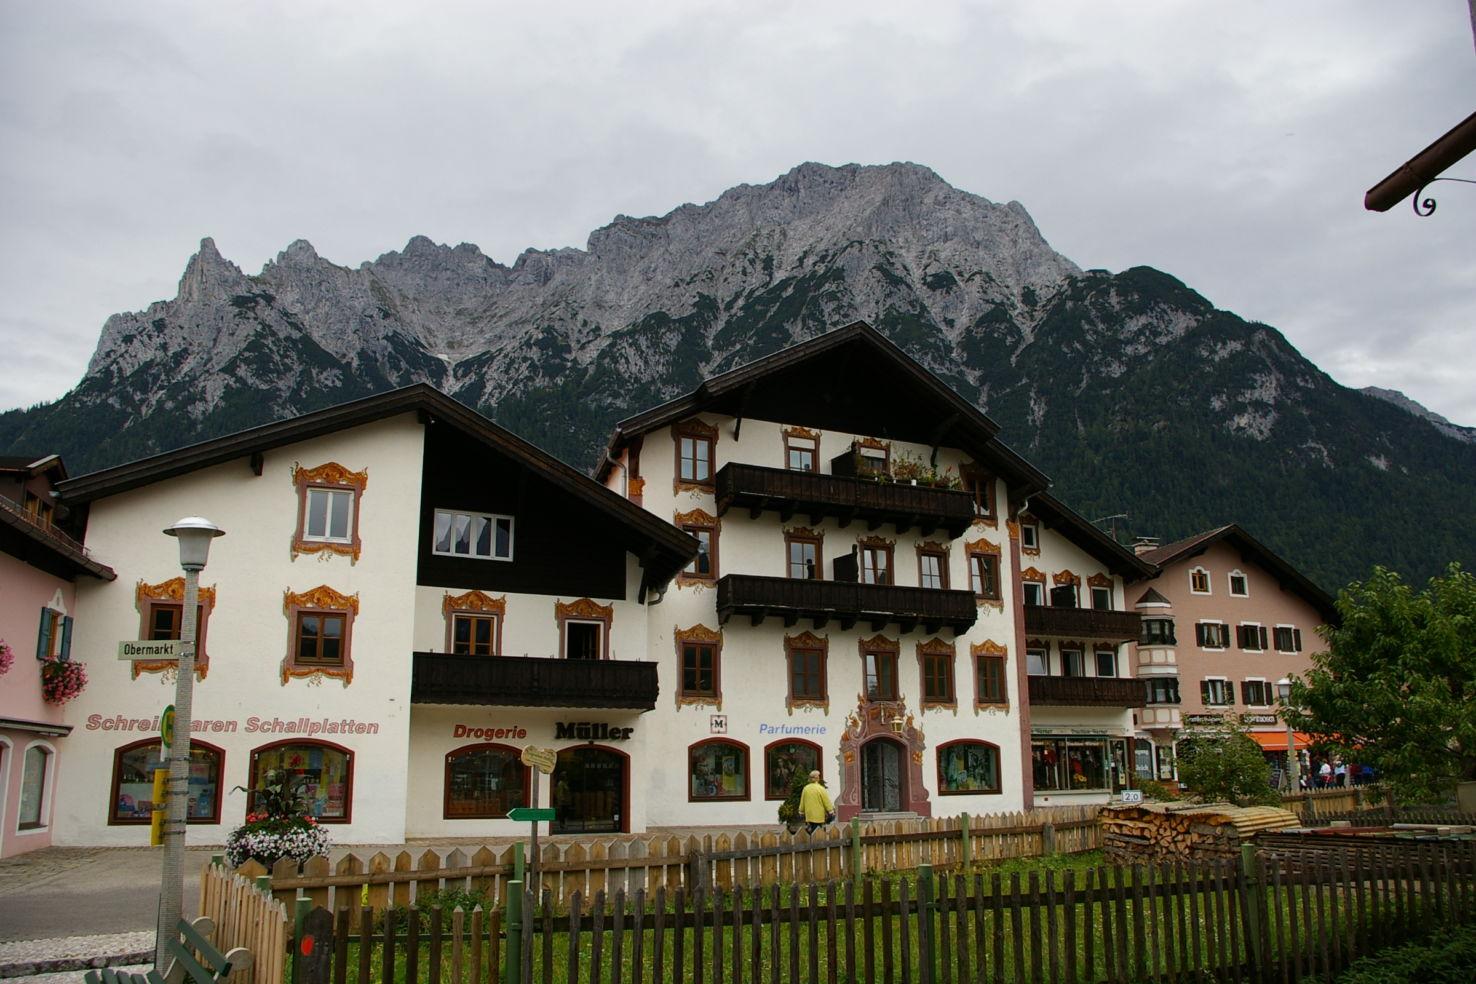 Karwendel Mountain in Mittenwald, Germany